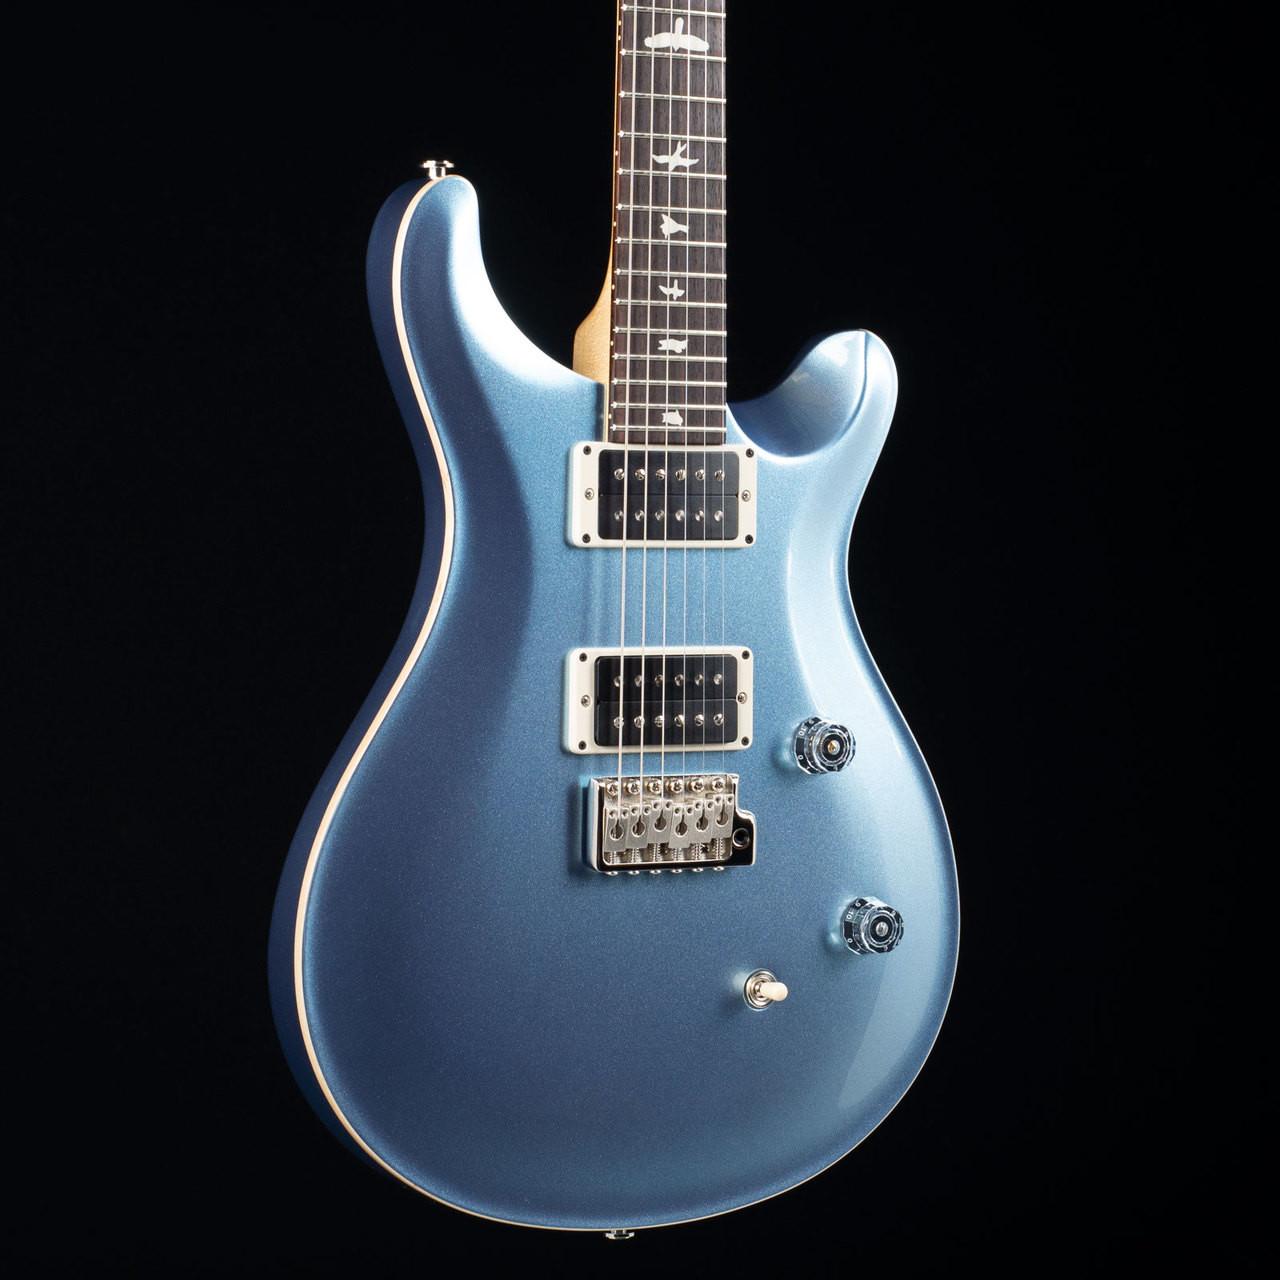 prs ce 24 frost blue metallic 2392 at moore guitars. Black Bedroom Furniture Sets. Home Design Ideas